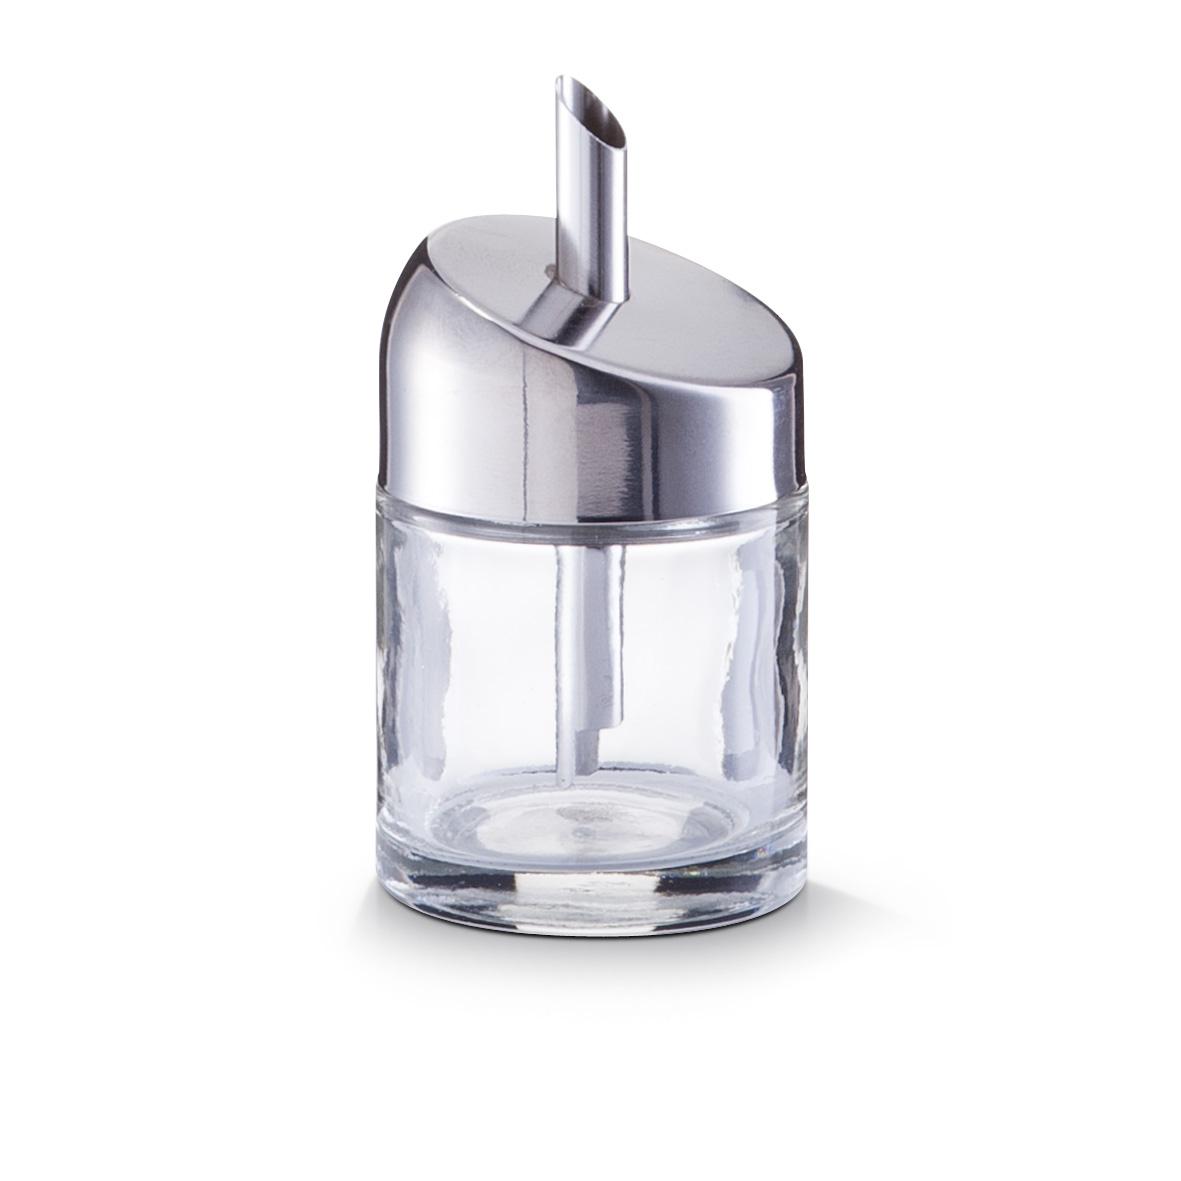 Емкость для сахара Zeller